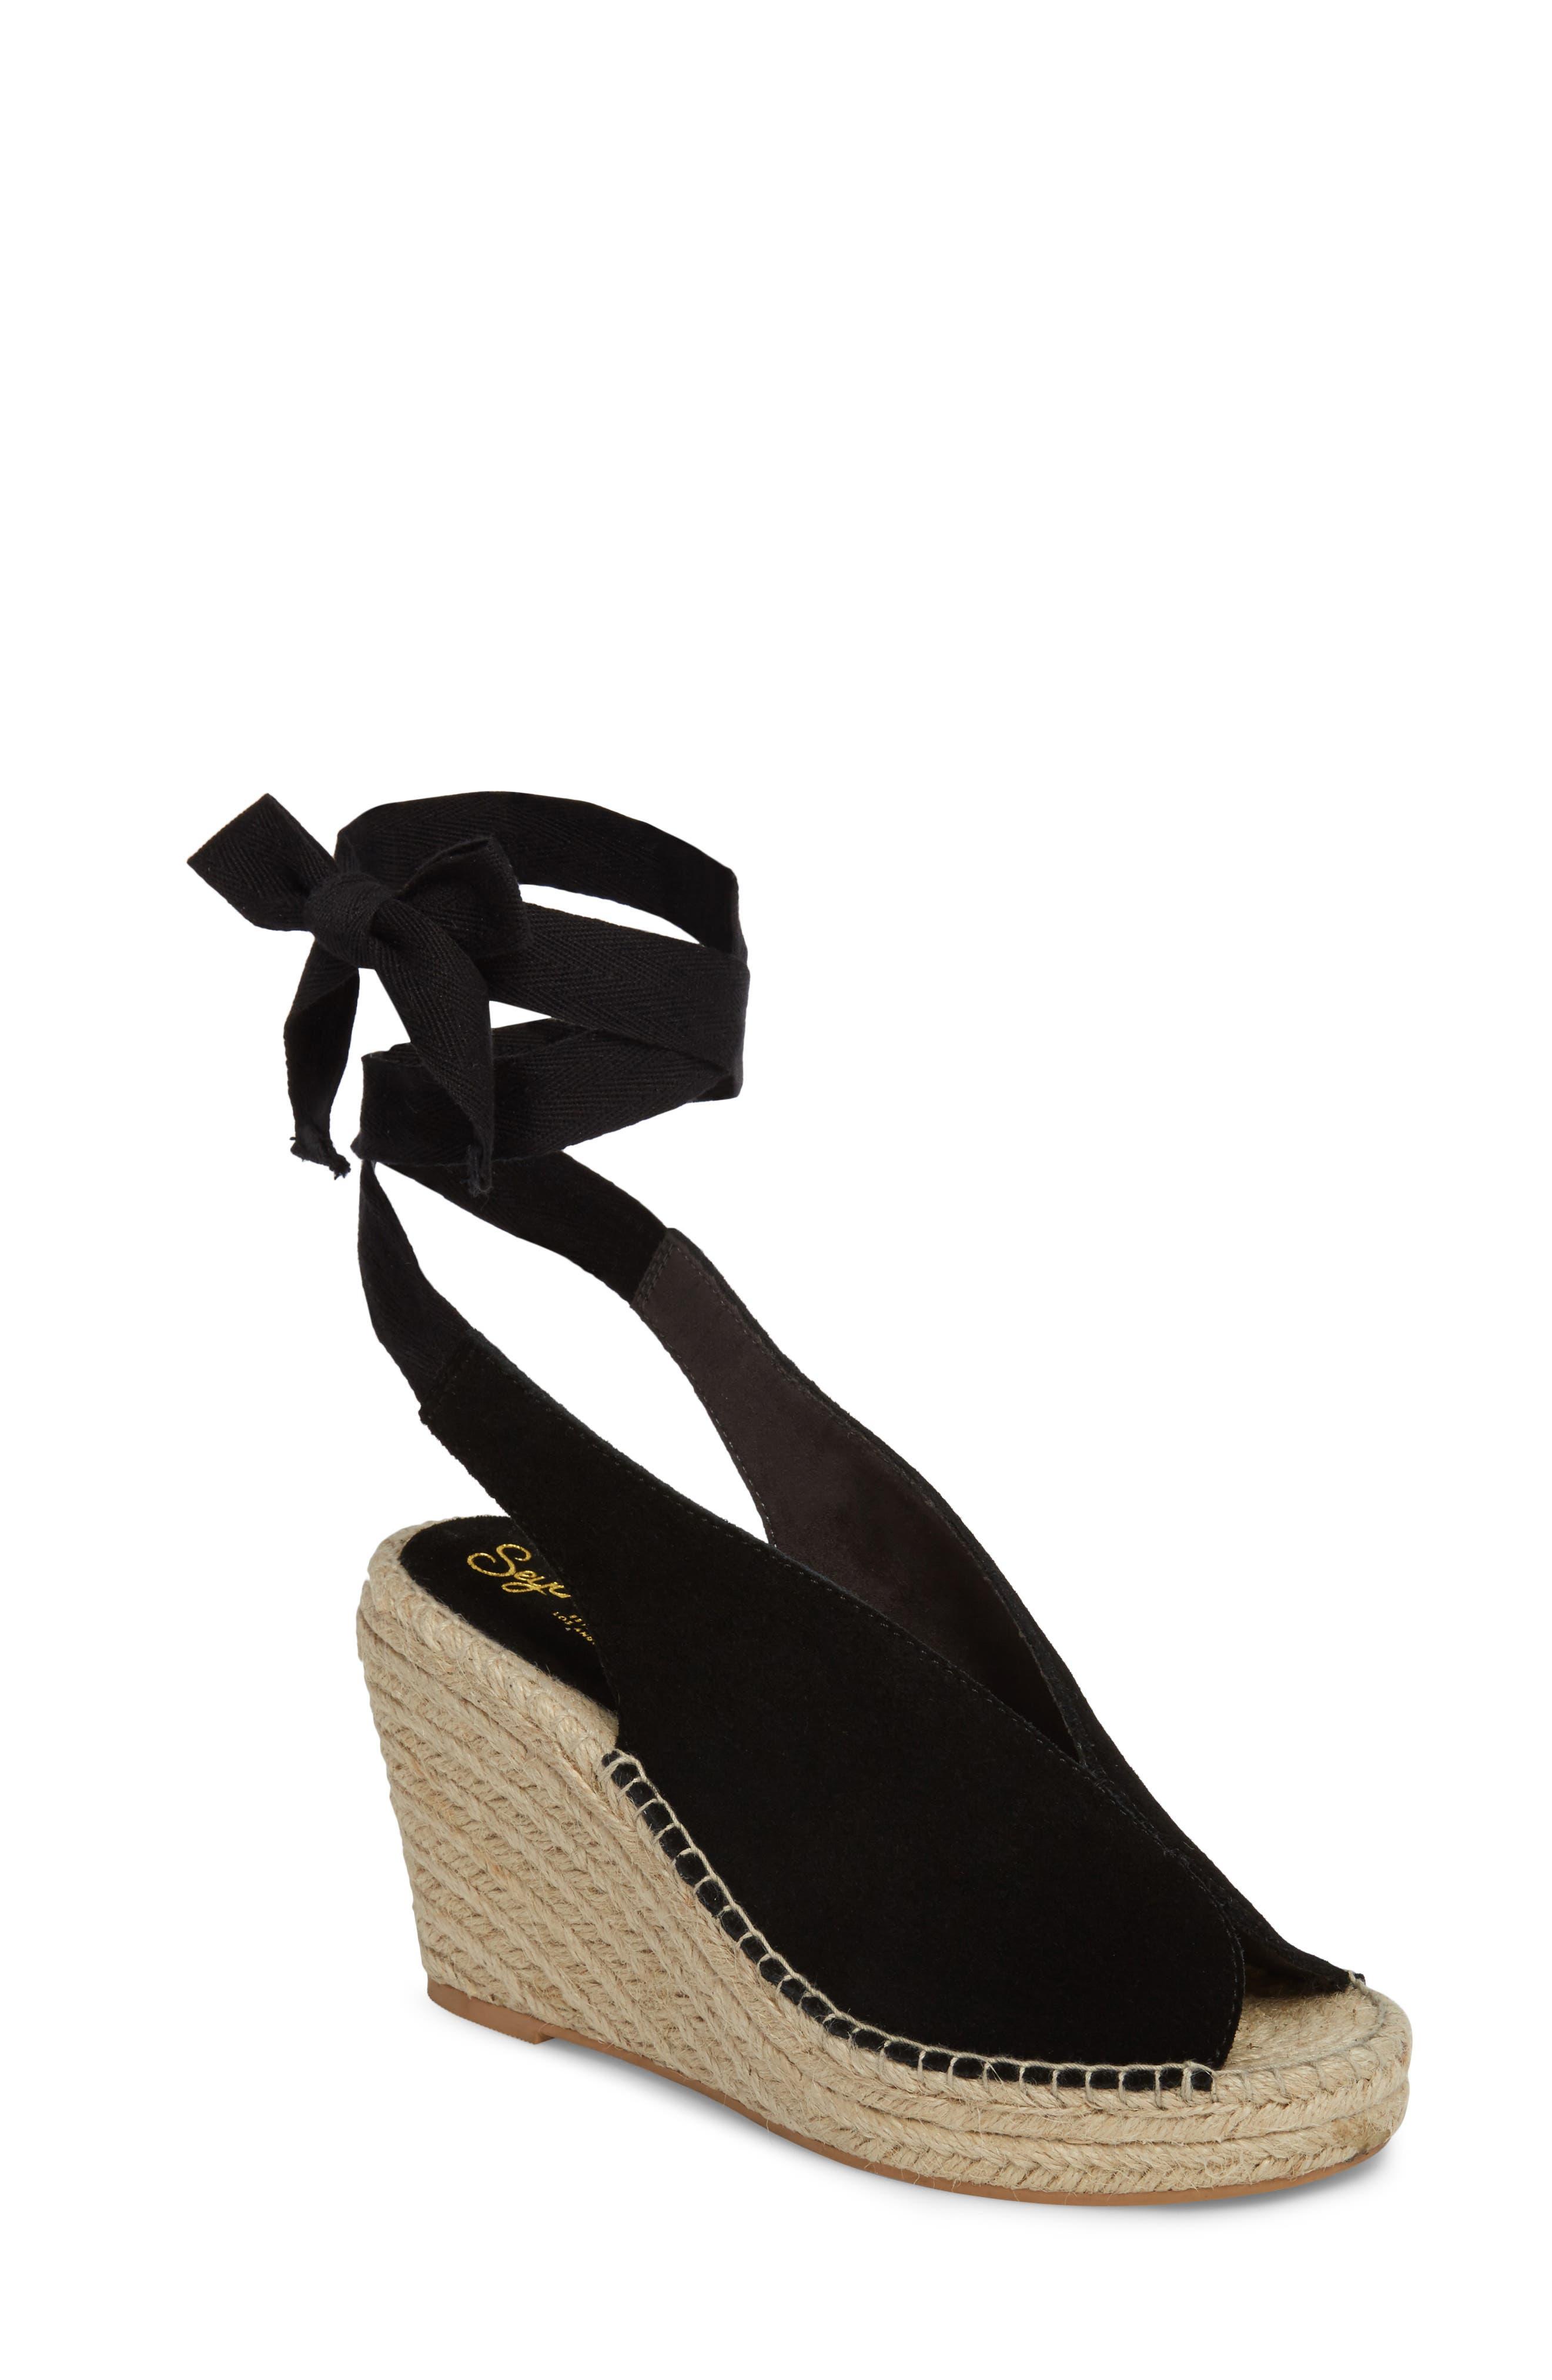 Interrelated Espadrille Wedge Sandal,                         Main,                         color, 001